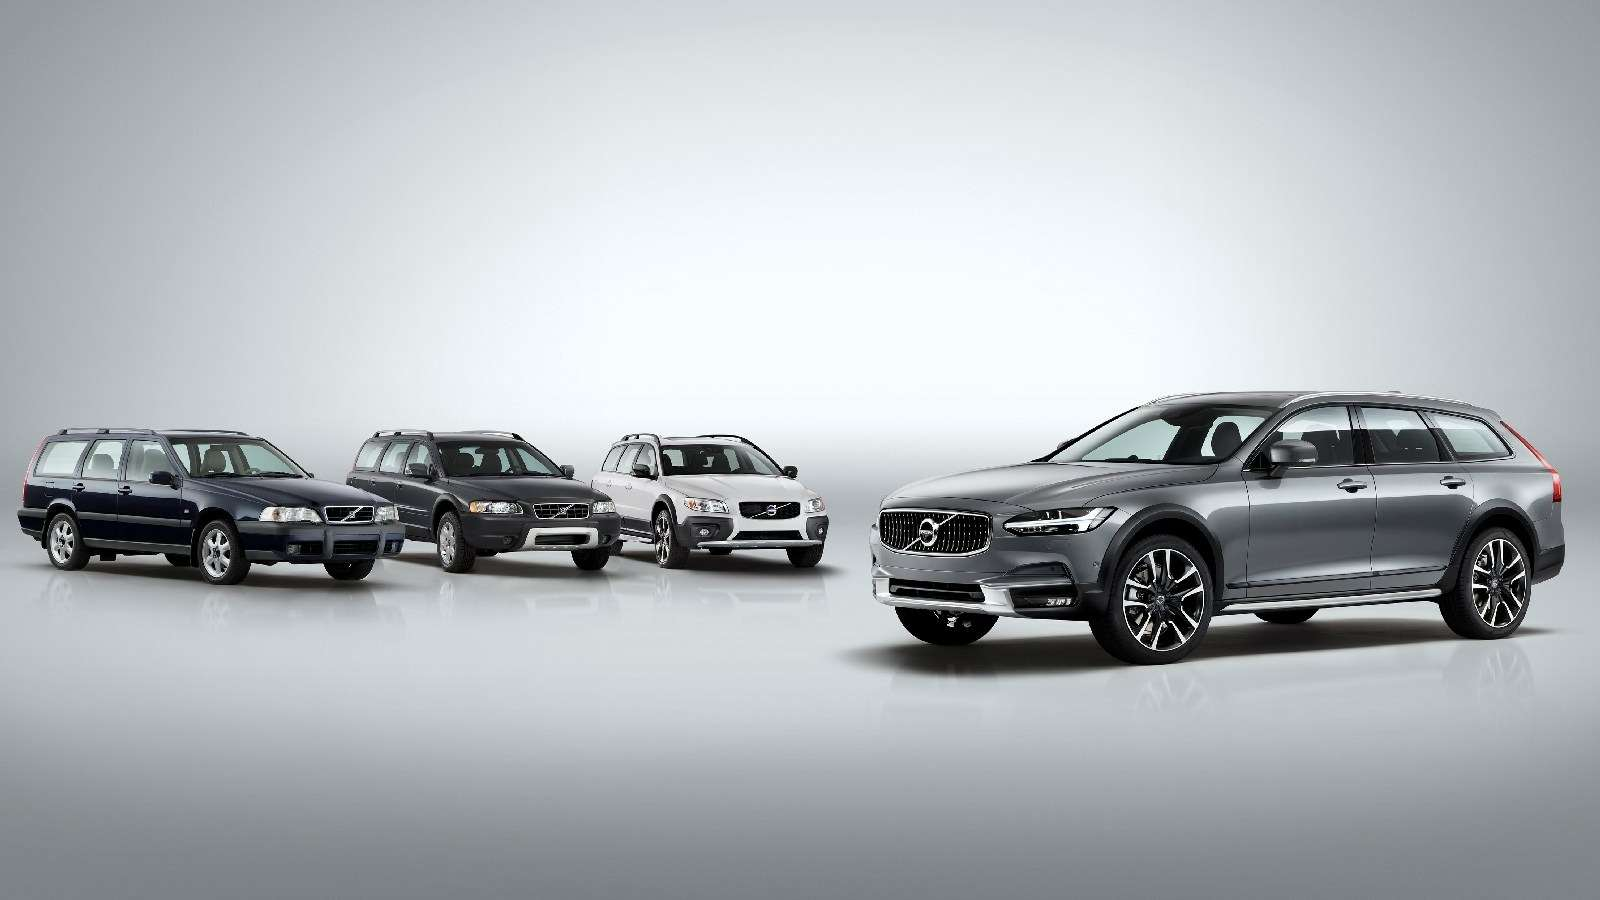 Такой «сарай» нам нужен: Volvo V90 Cross Country представлен официально— фото 635269